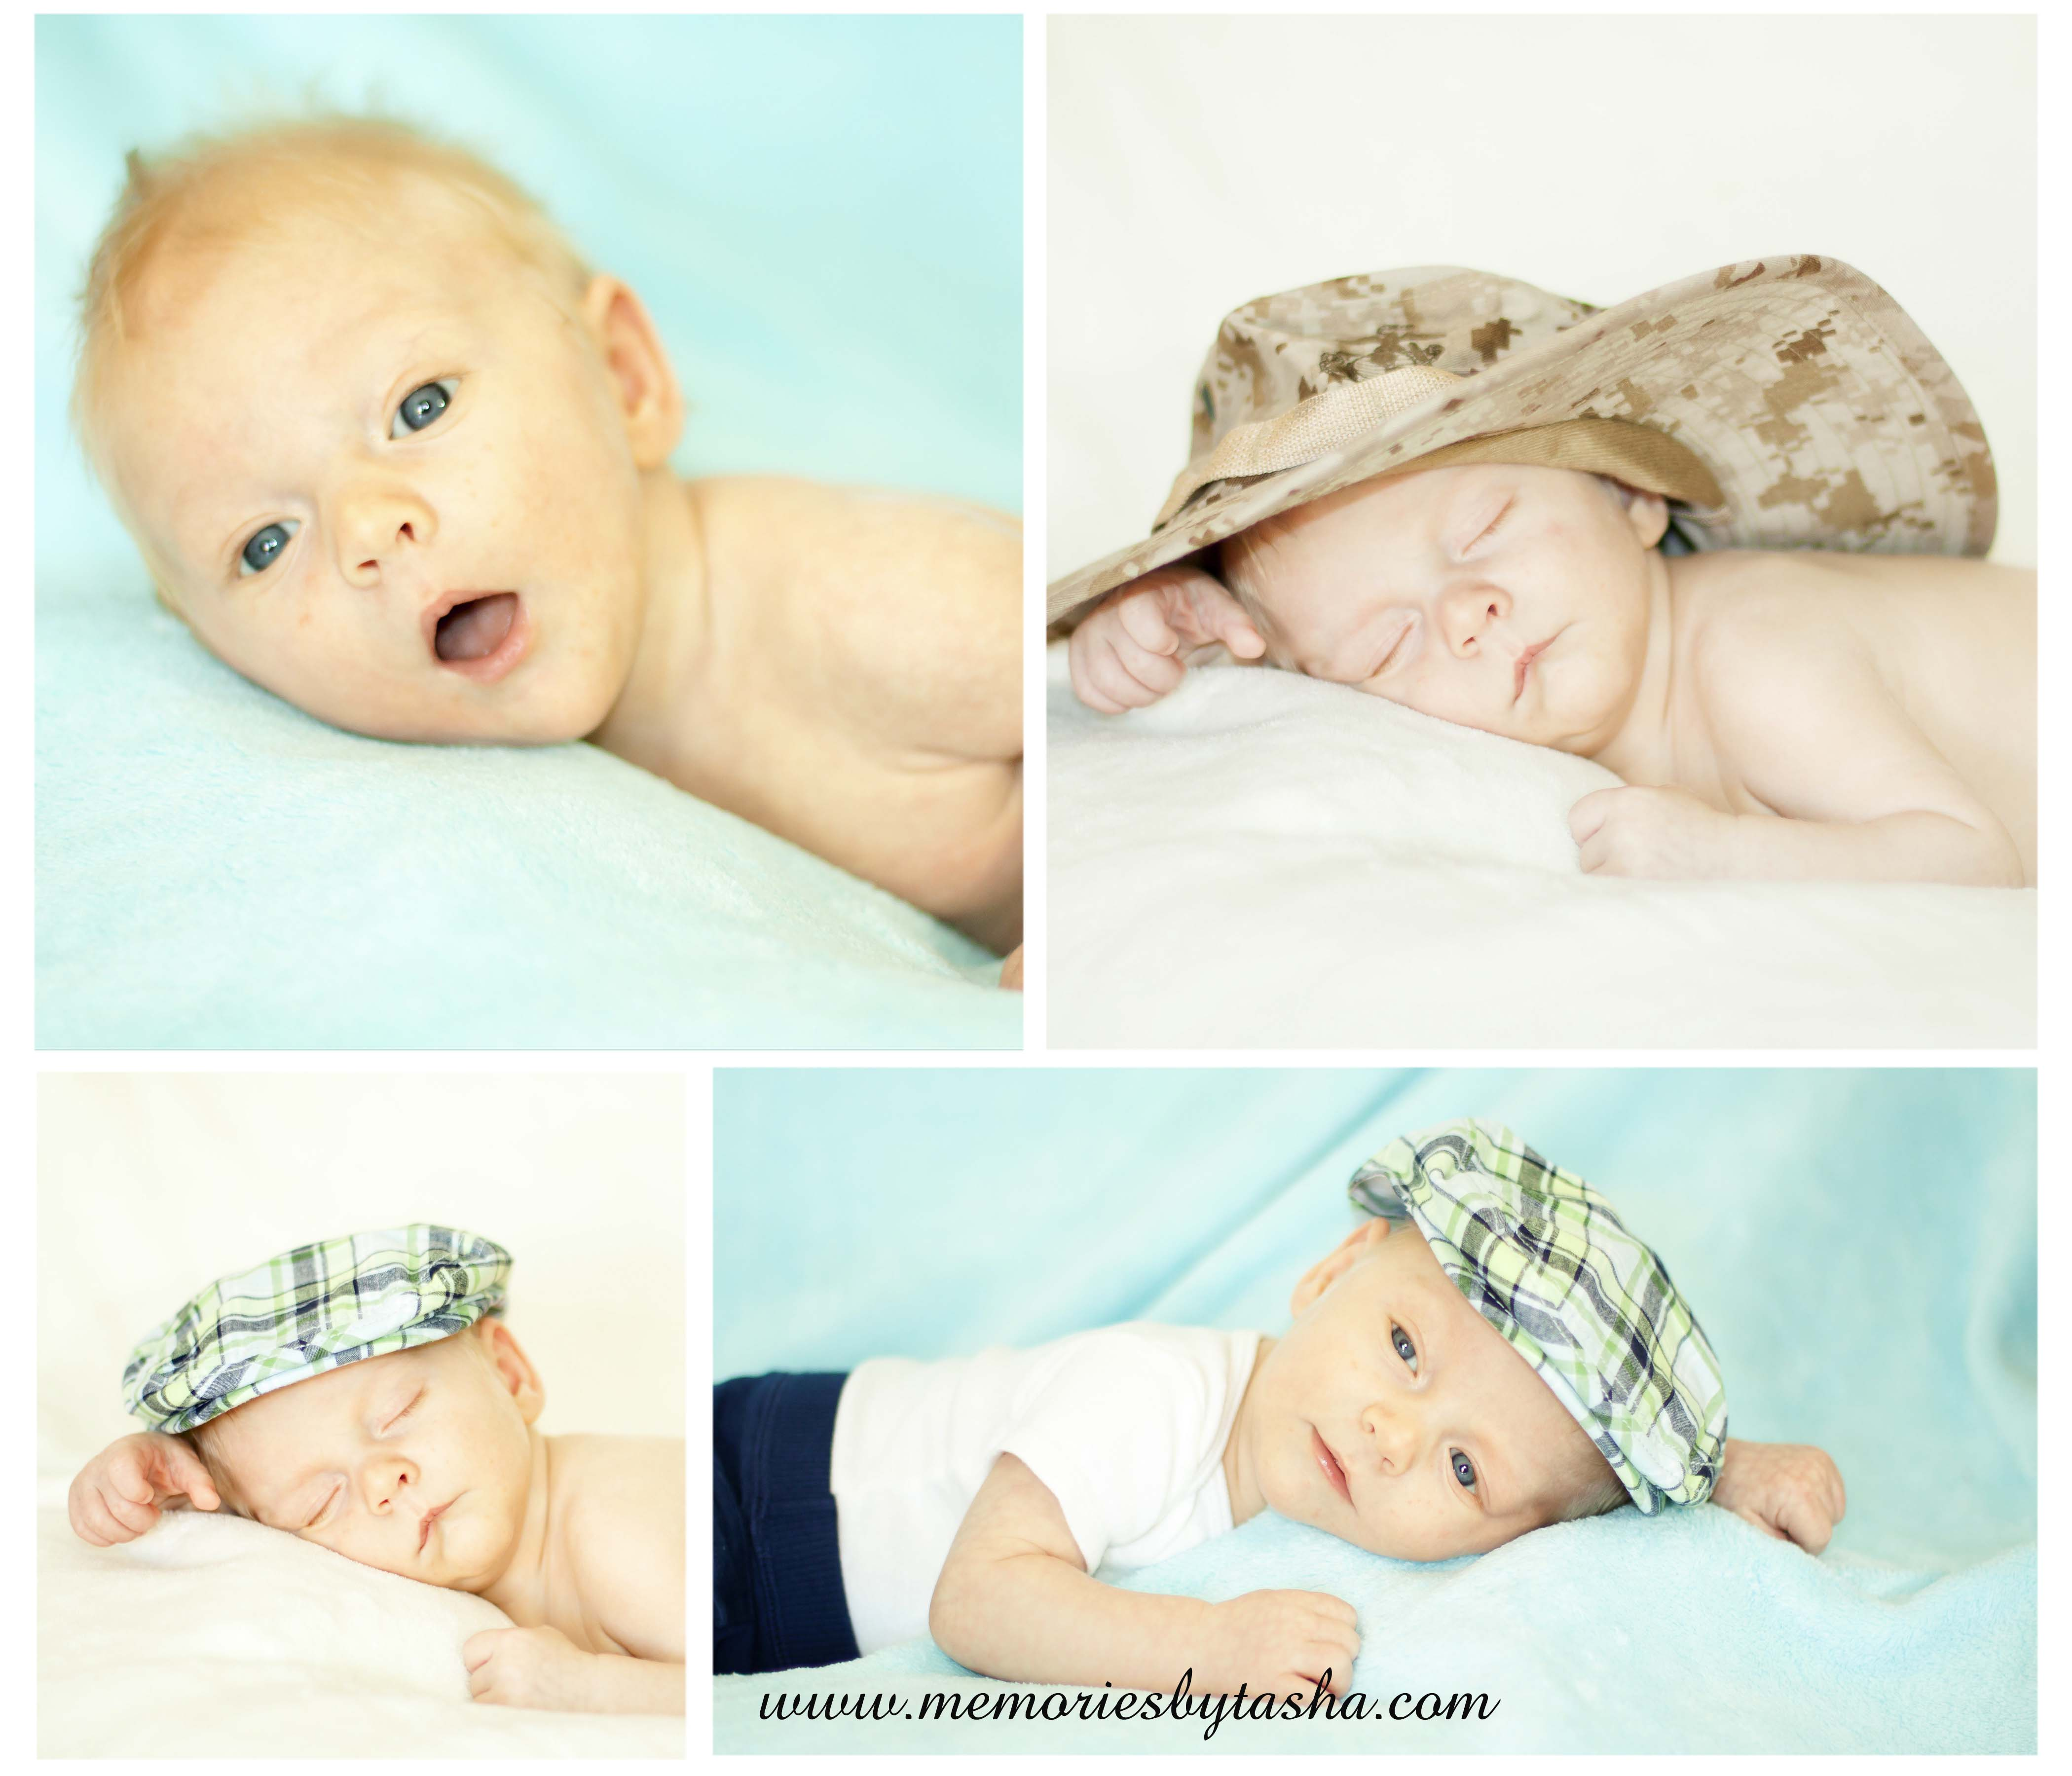 Twentynine Palms Photographer - Newborn Photography - Liam-04